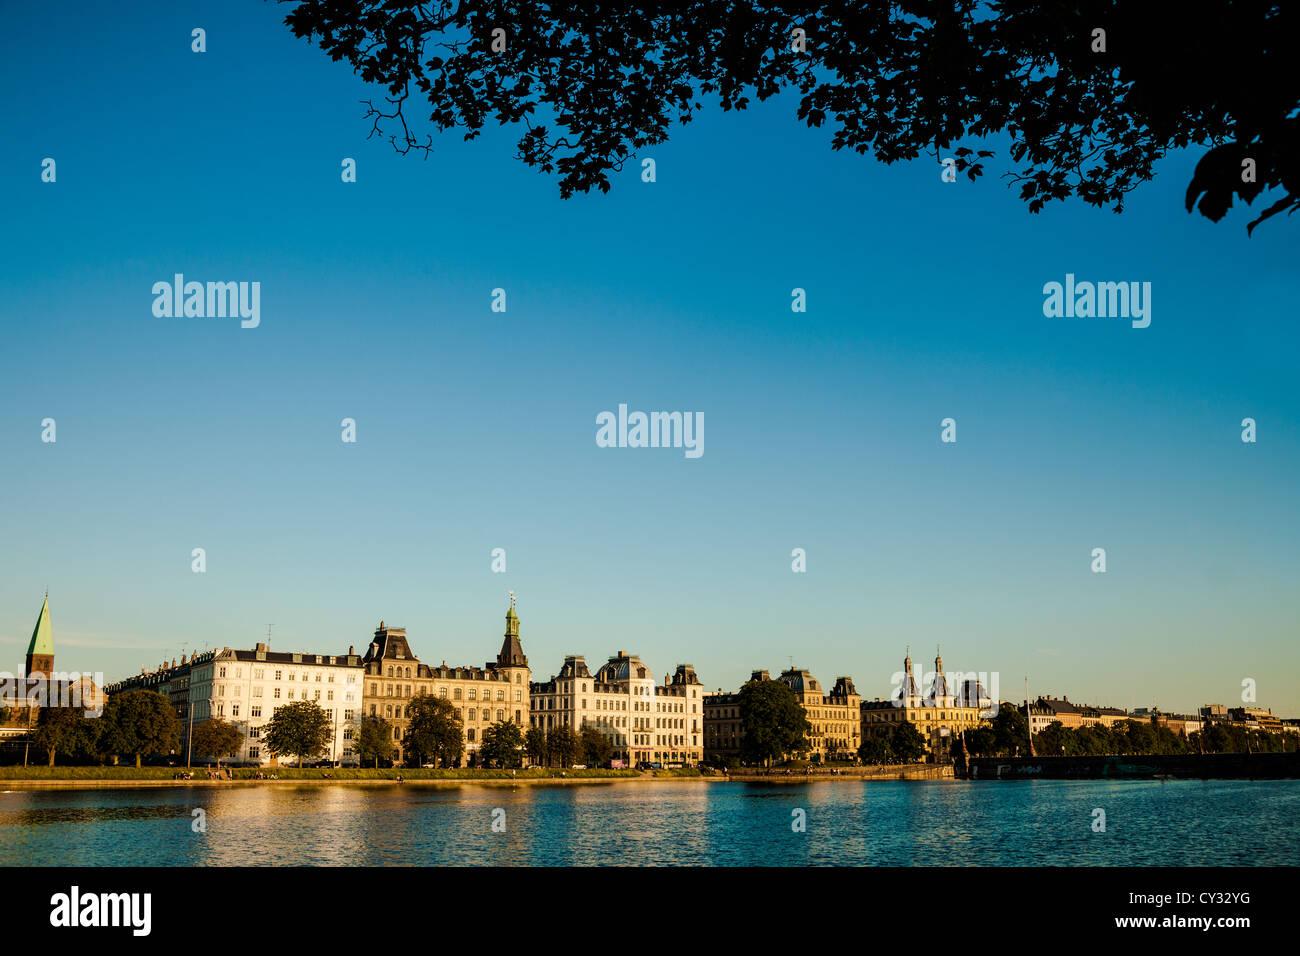 View across Sortedams Sø, one of Copenhagen's lakes - Stock Image